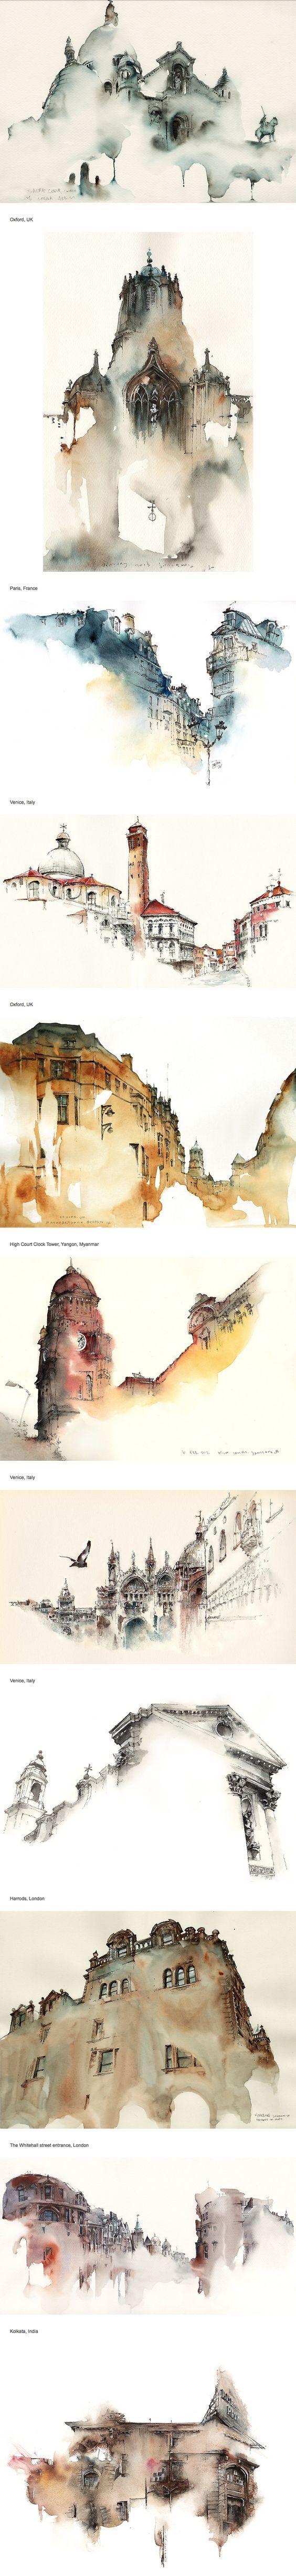 Elusive Architecture in Watercolors of Korean Artist Sunga Park: